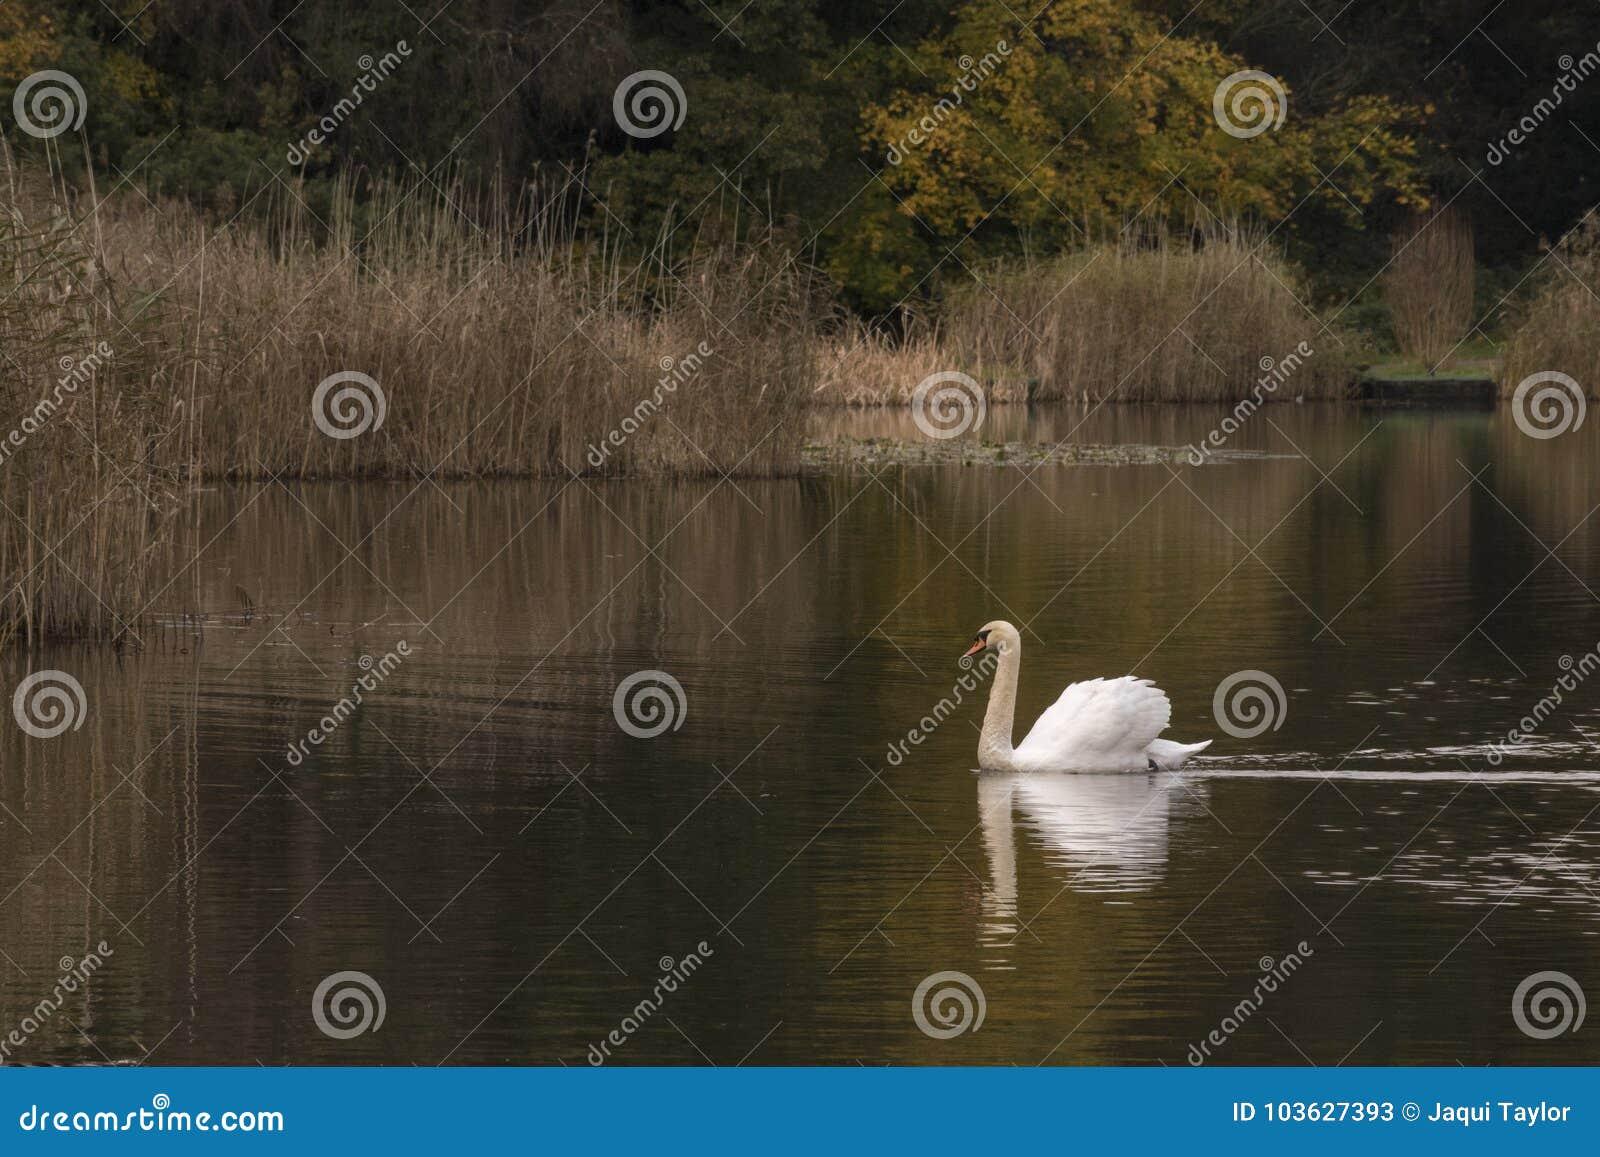 White swan on a dark morning